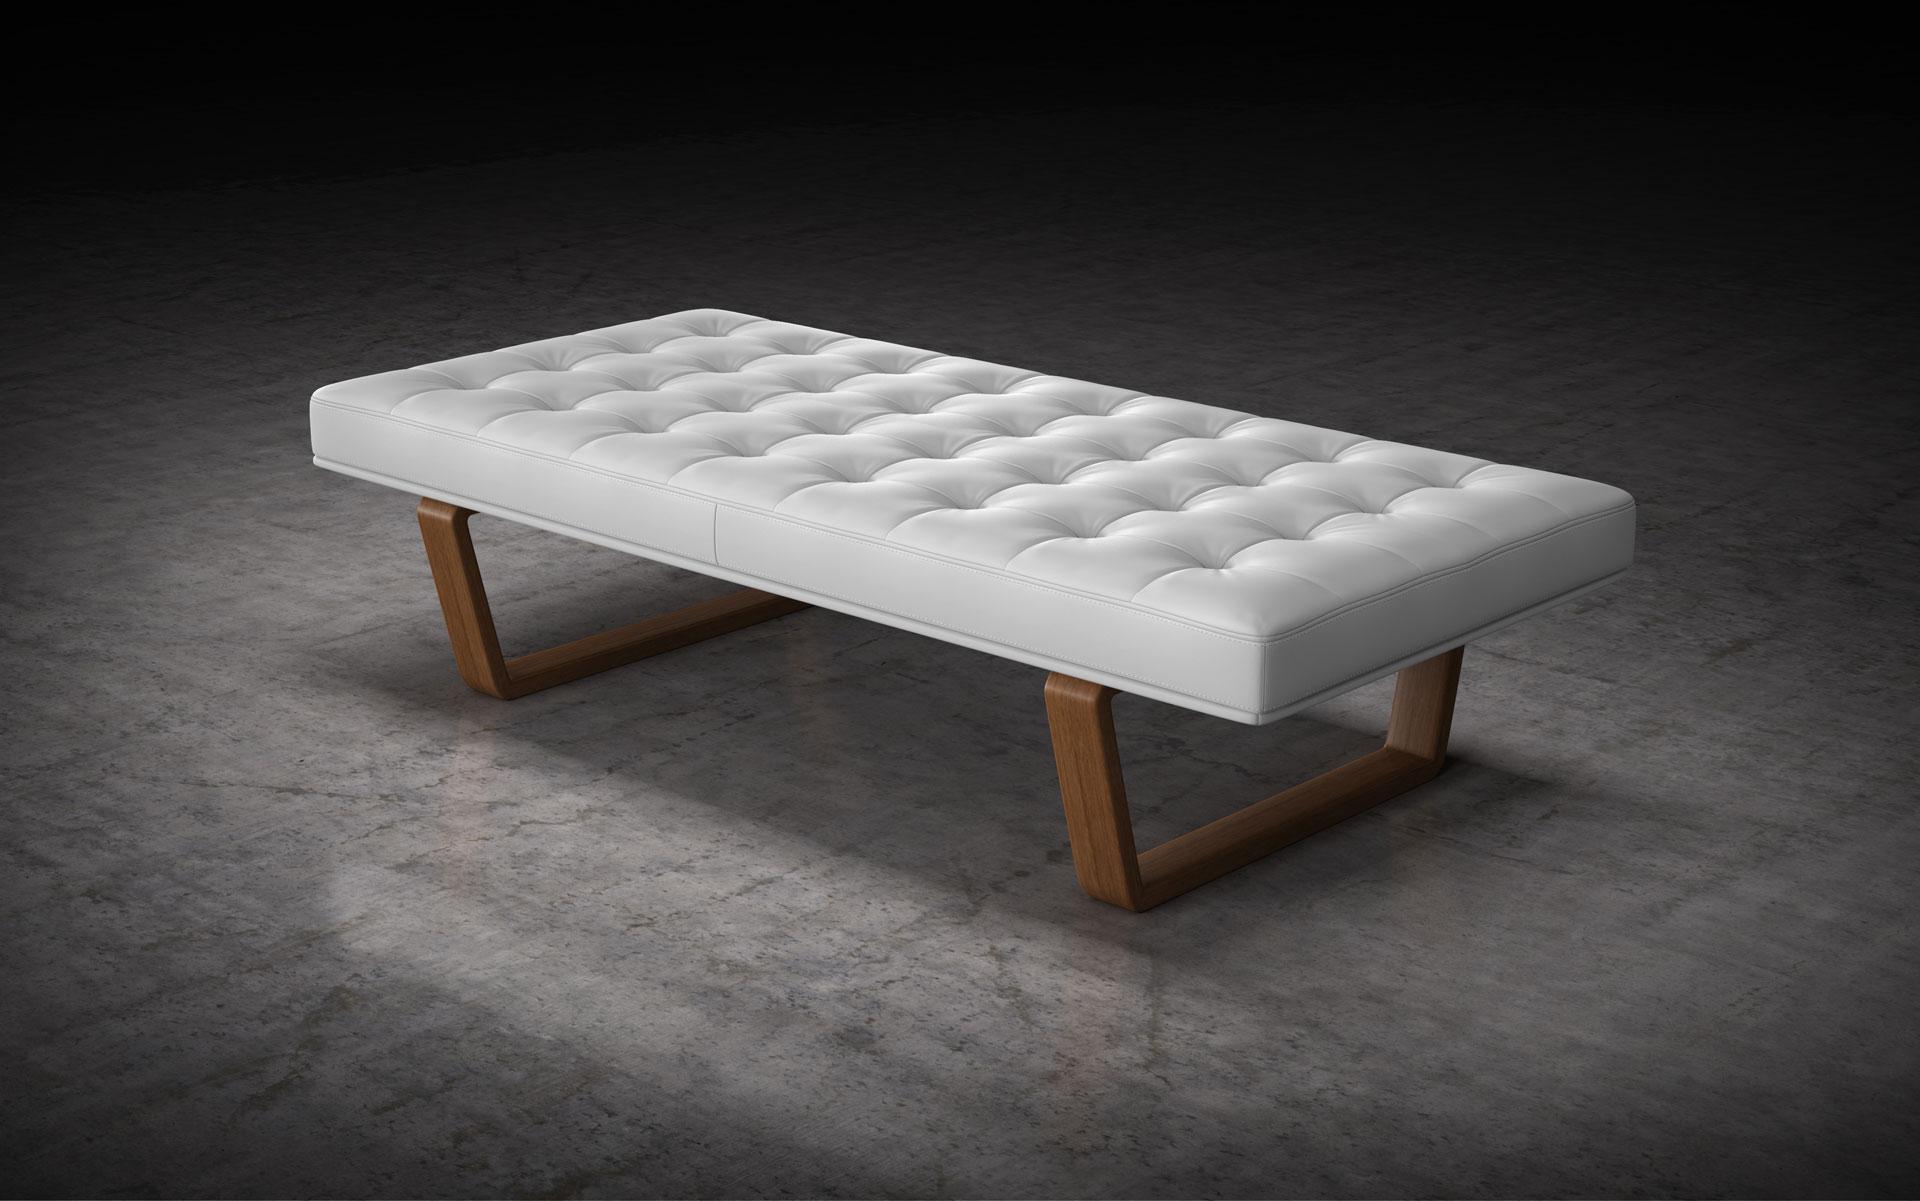 Swell Benches Ottomans 3D Warehouse Short Links Chair Design For Home Short Linksinfo